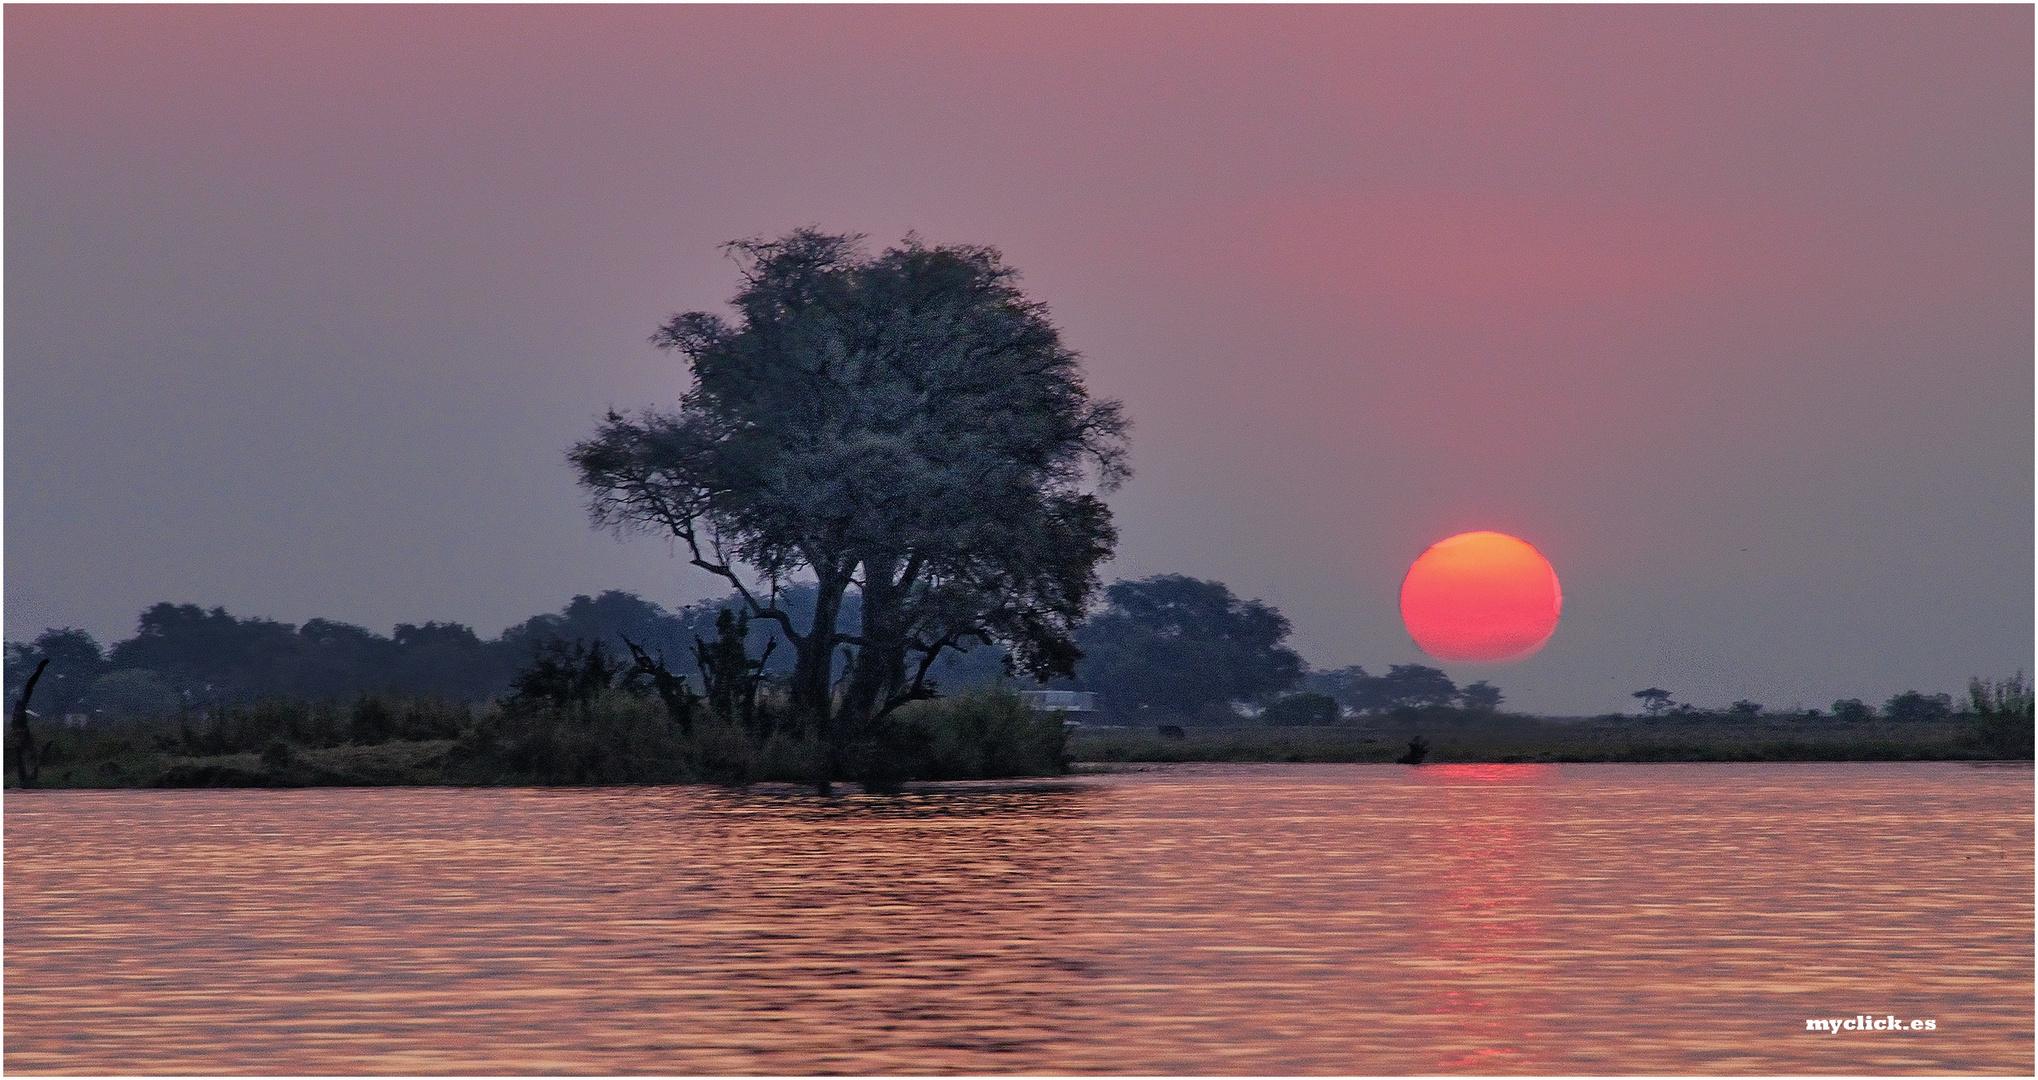 MEMORIAS DE AFRICA-ANOCHECER EN EL RIO ZAMBEZE-ZAMBIA